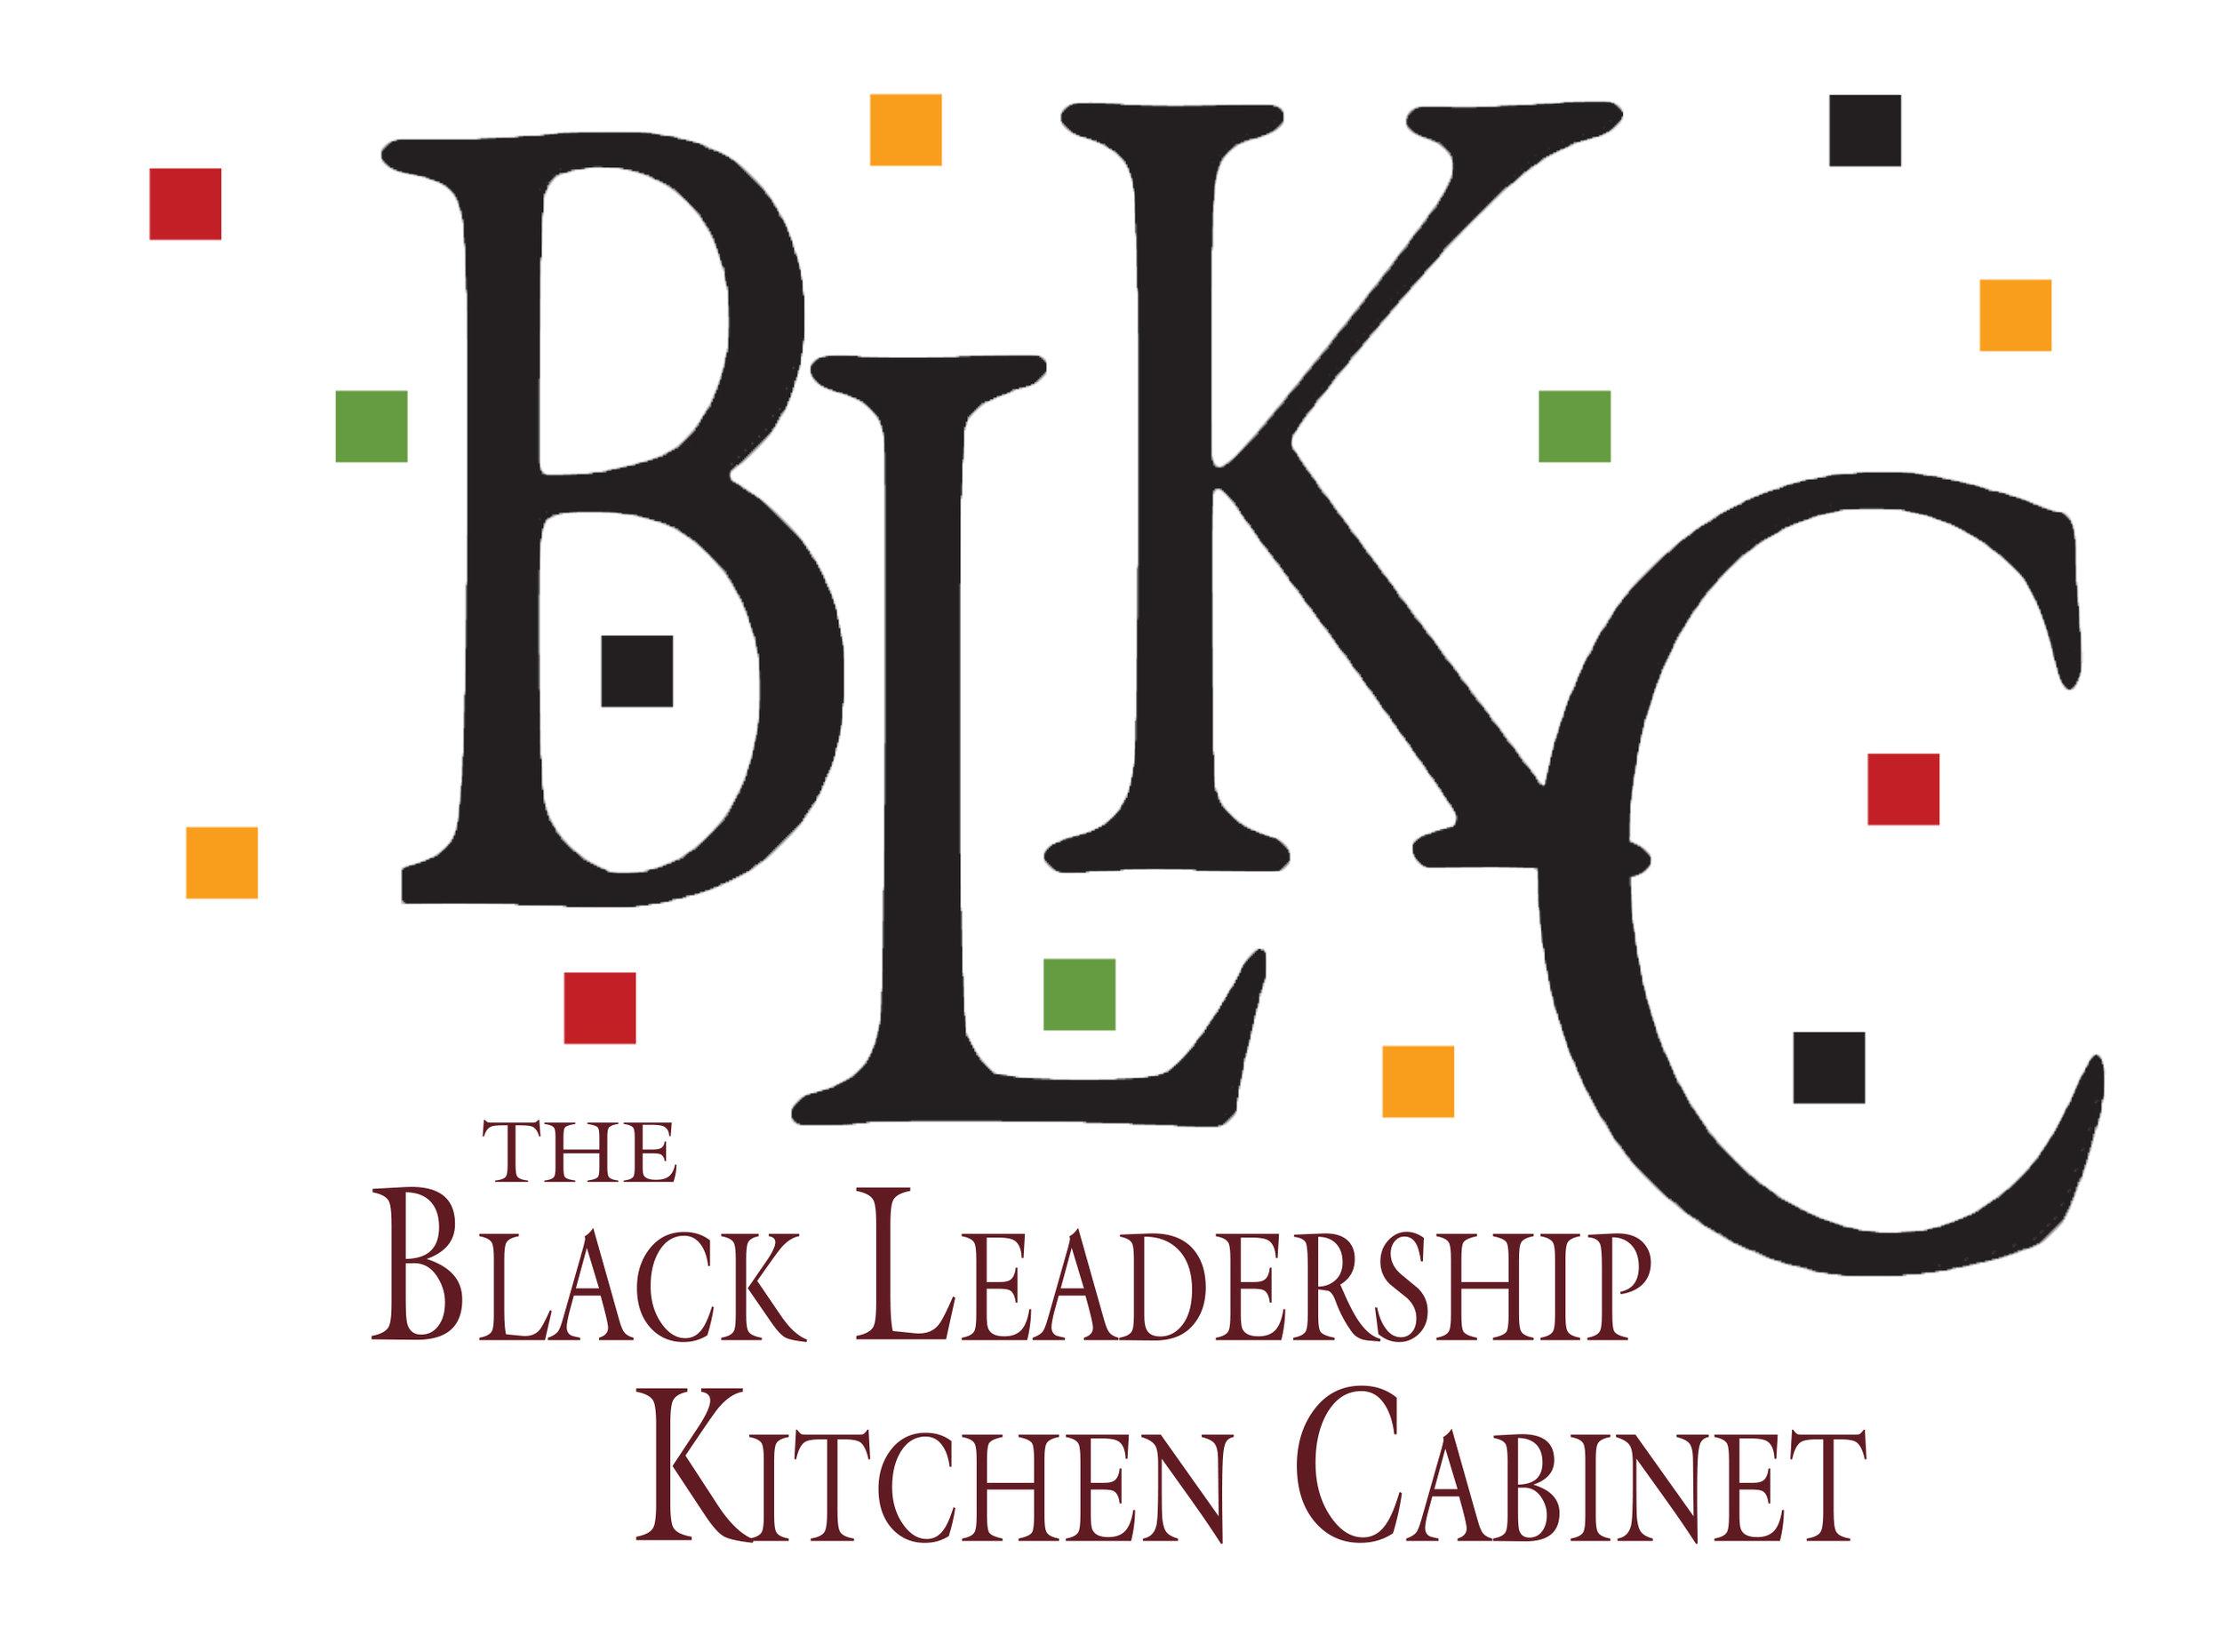 BLKC-logo-letters-final.jpg